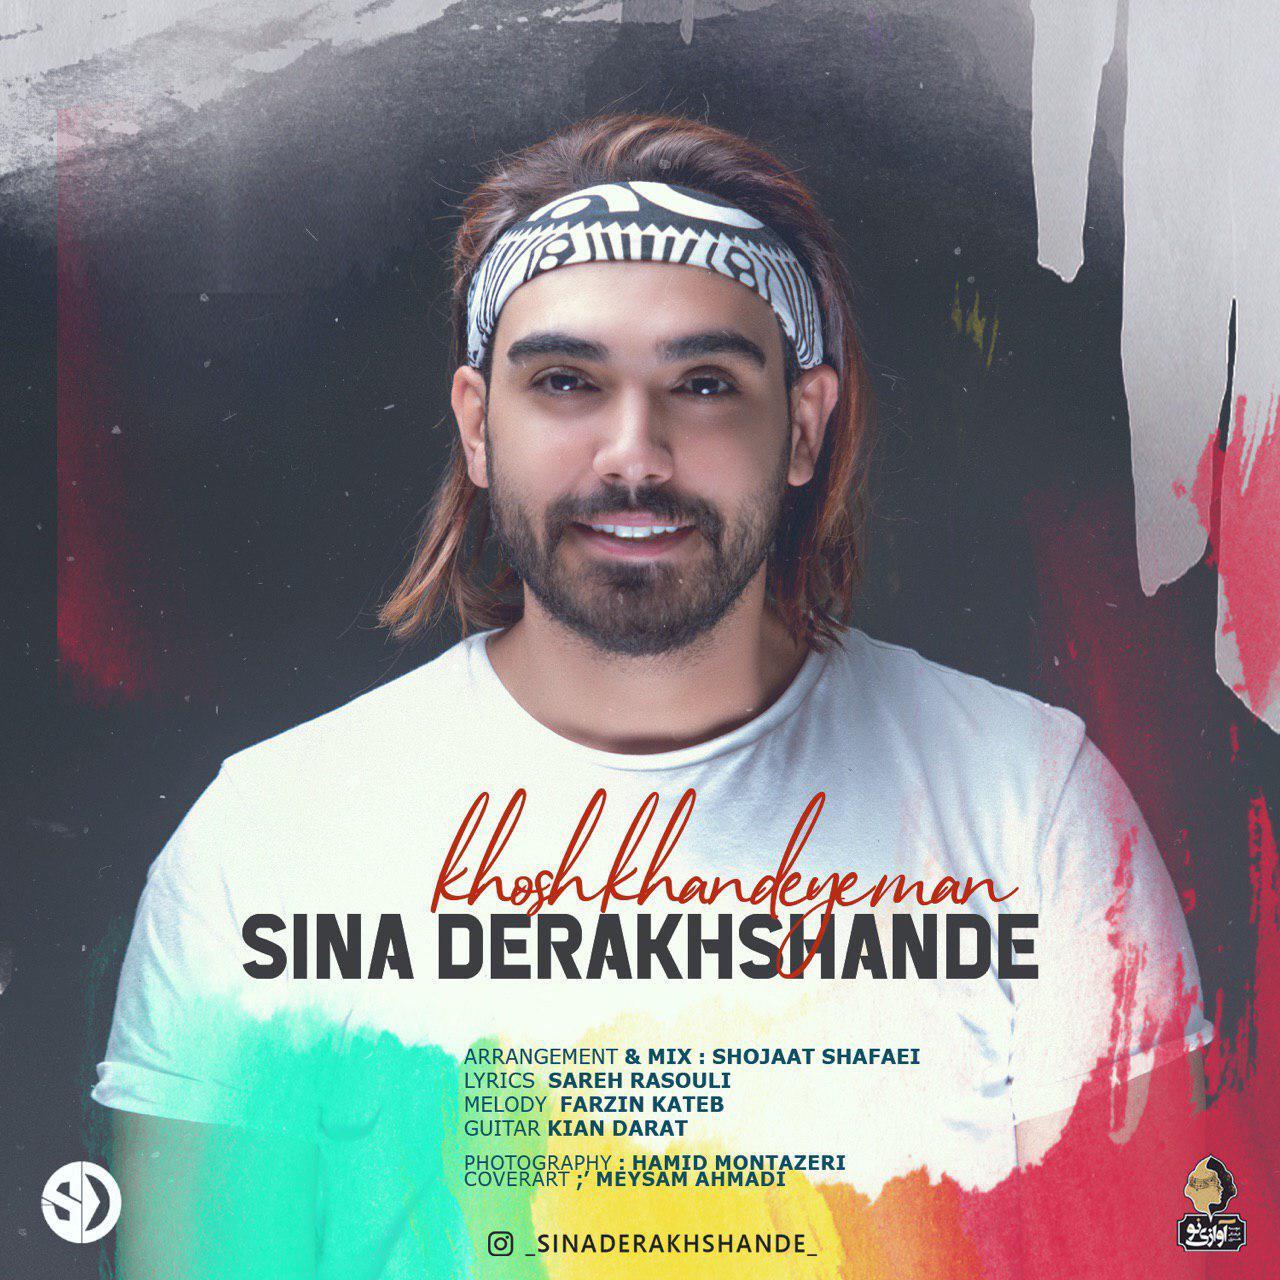 Sina Derakhshande – Khosh Khandeye Man